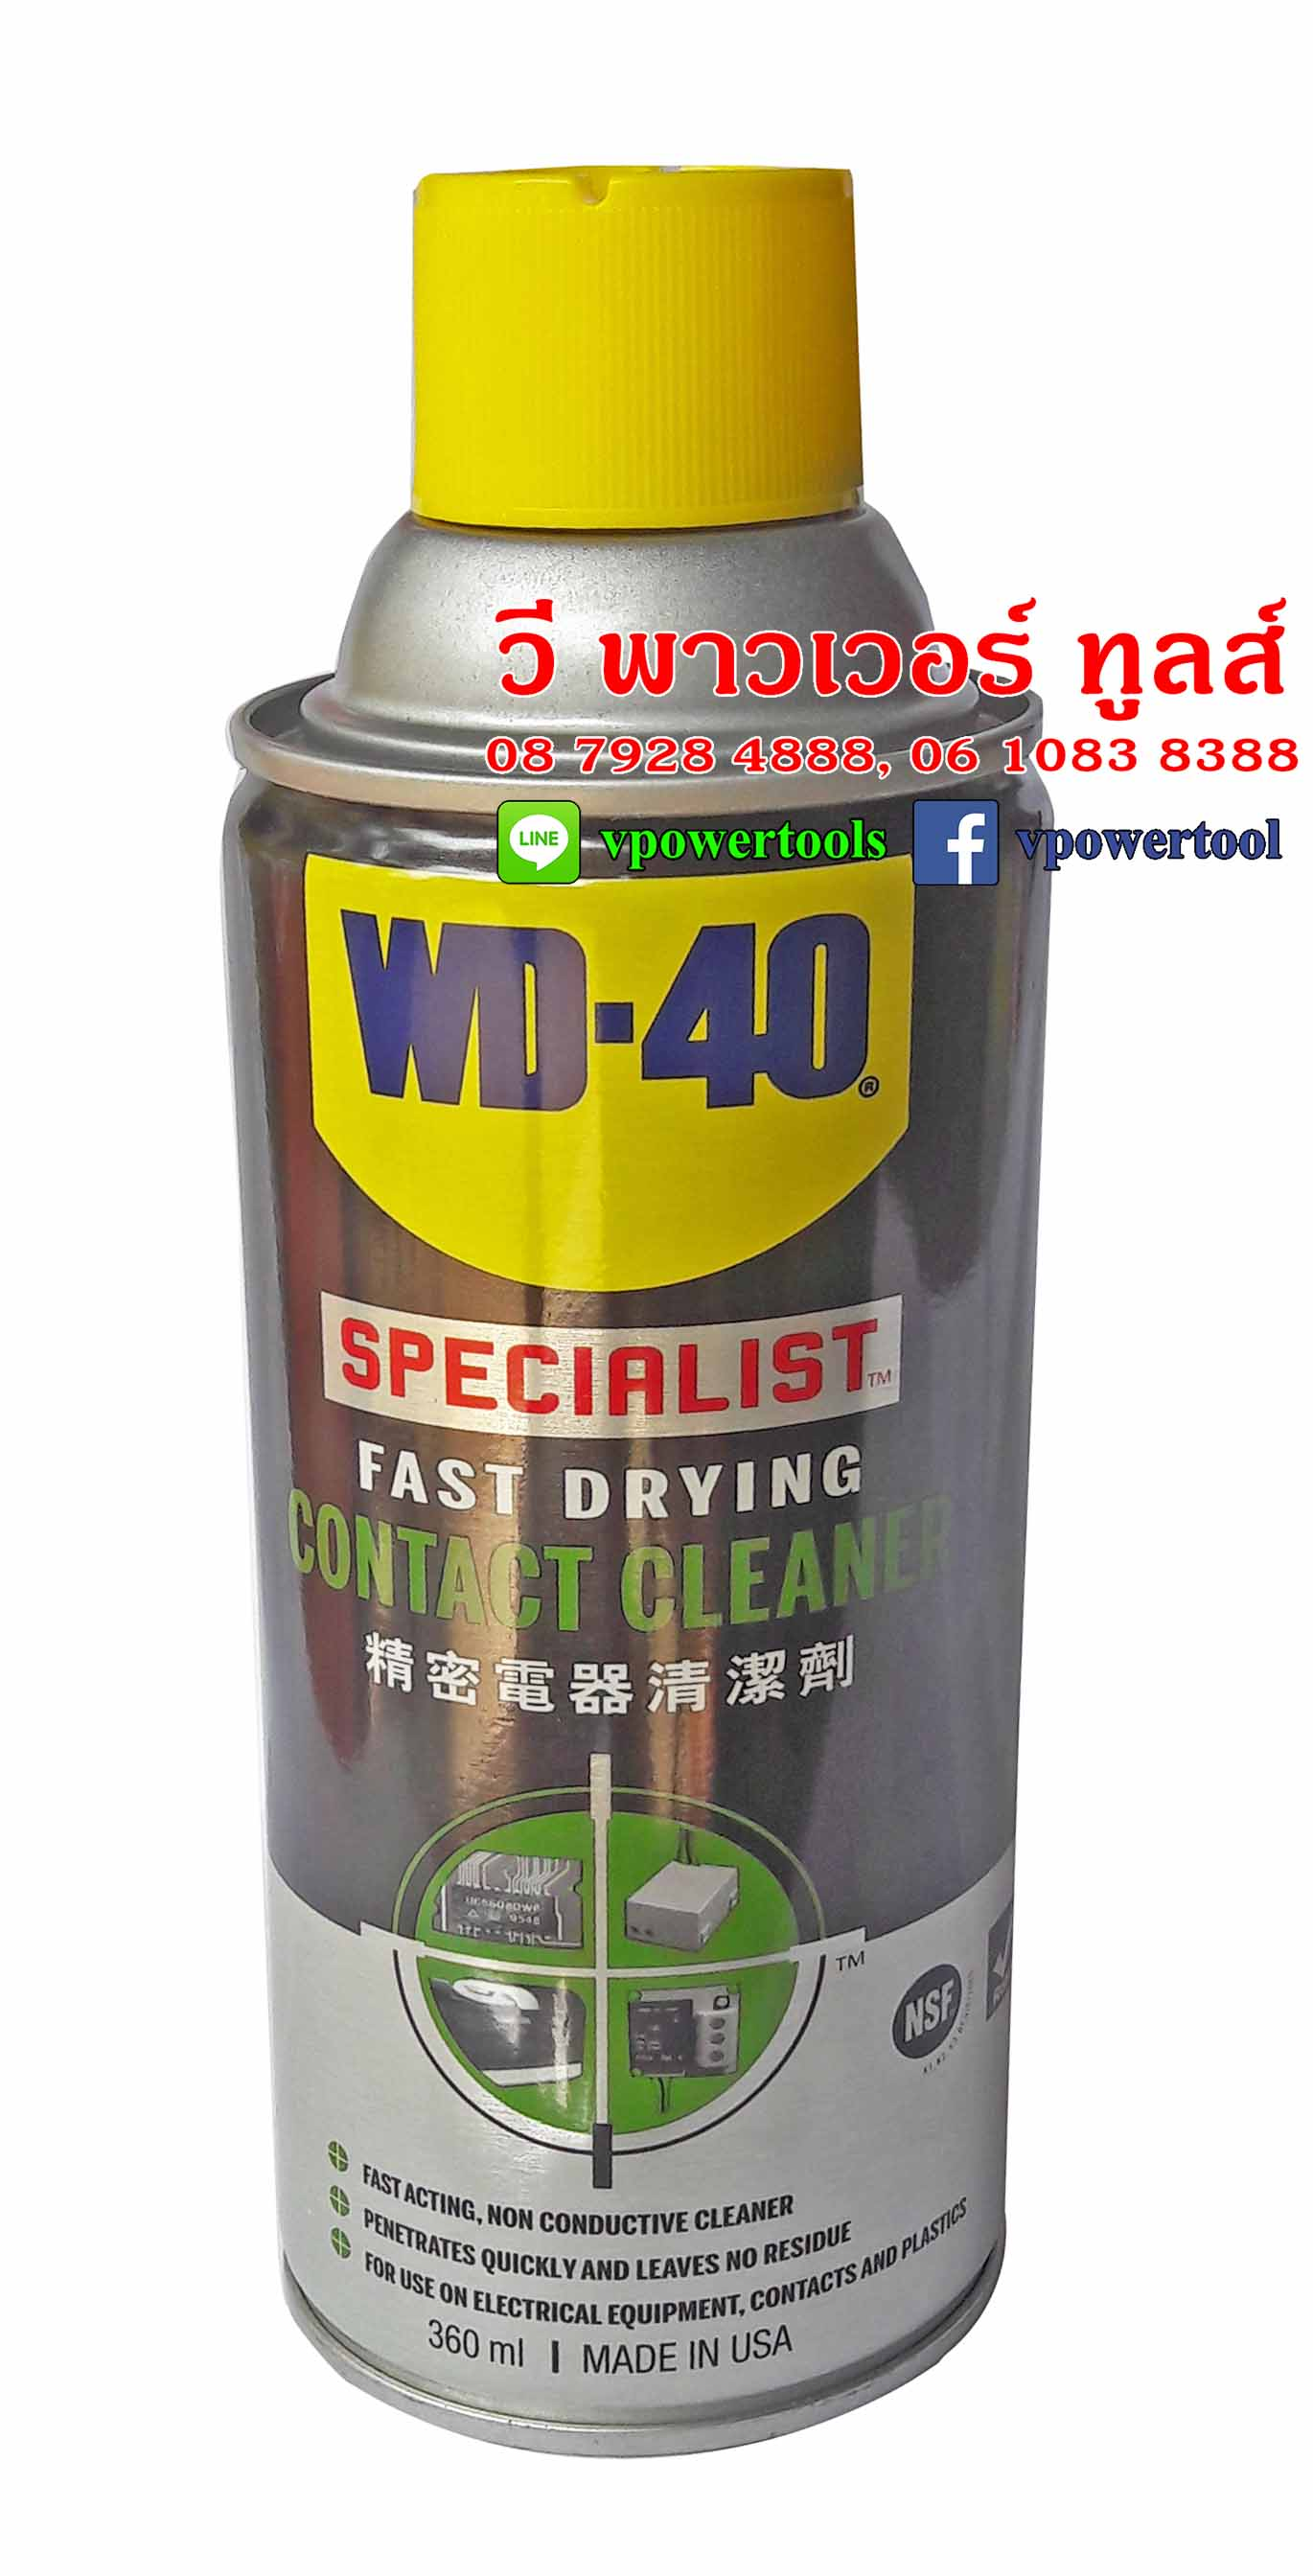 WD-40 SPECIALIST CONTACT CLEANER คอนแทค คลีนเนอร์ น้ำยาล้างหน้าสัมผัสทางไฟฟ้า หน้าคอนแทค 360มล.